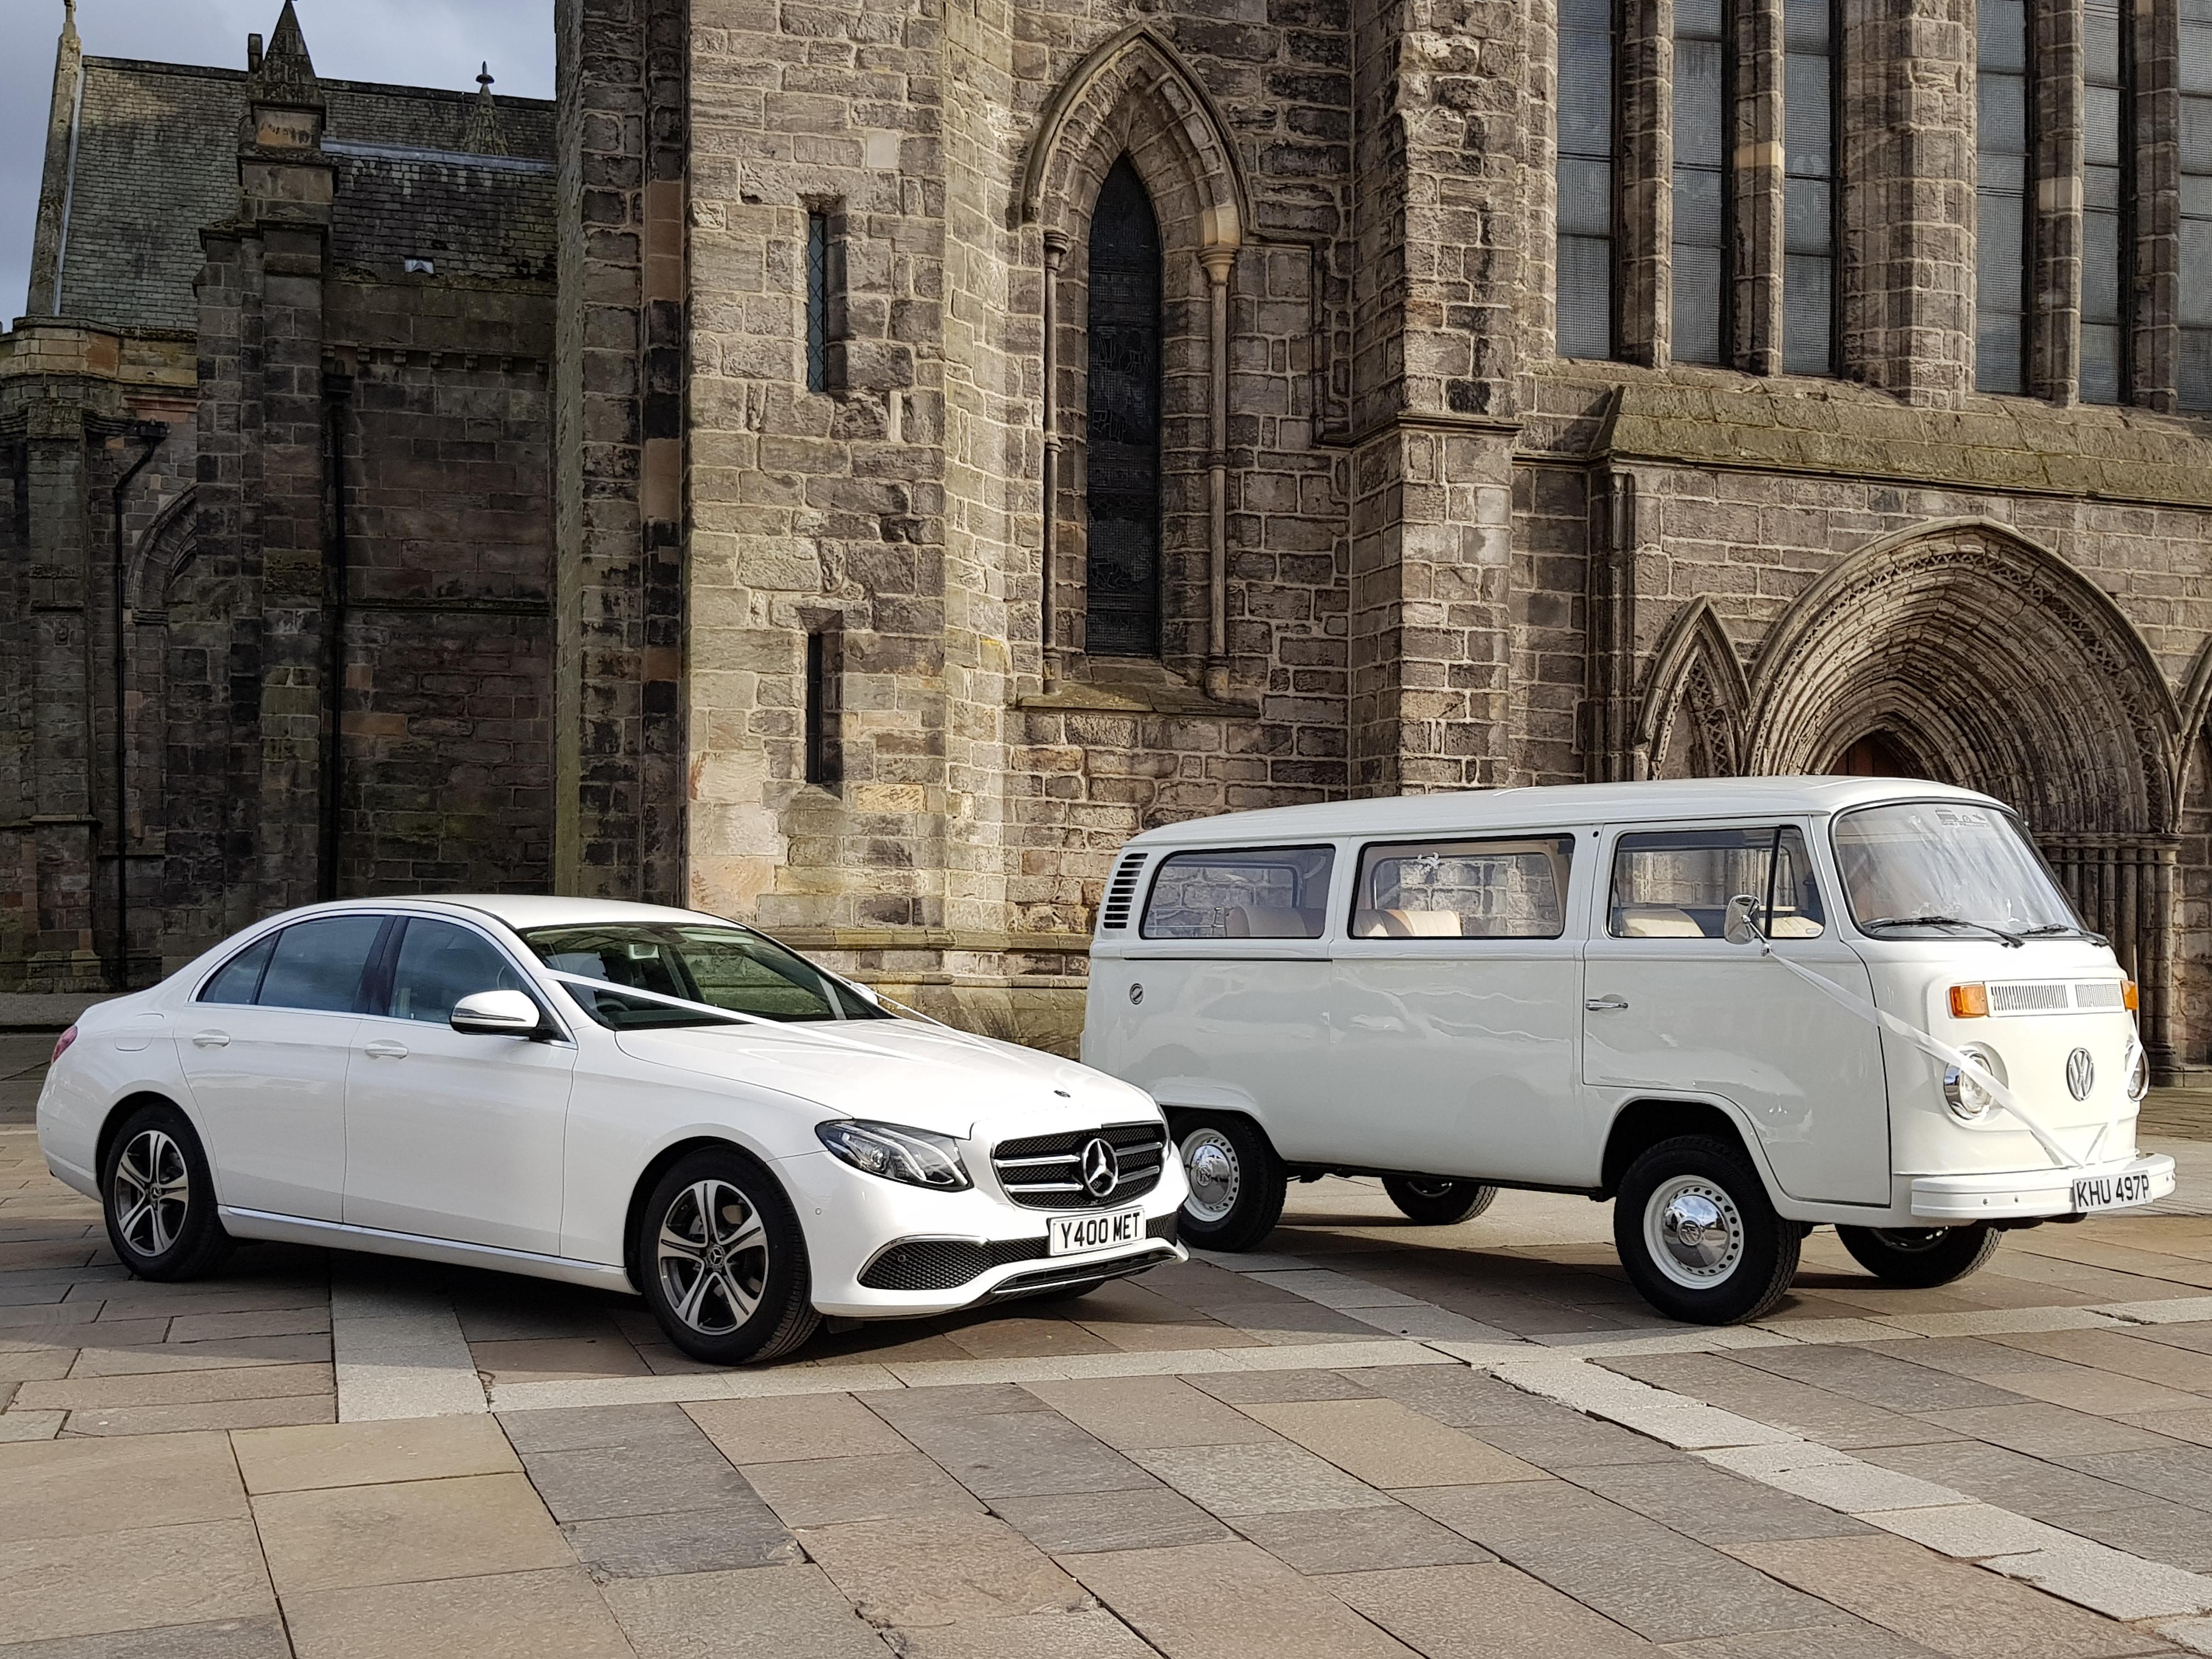 Whit E Class & VW Camper